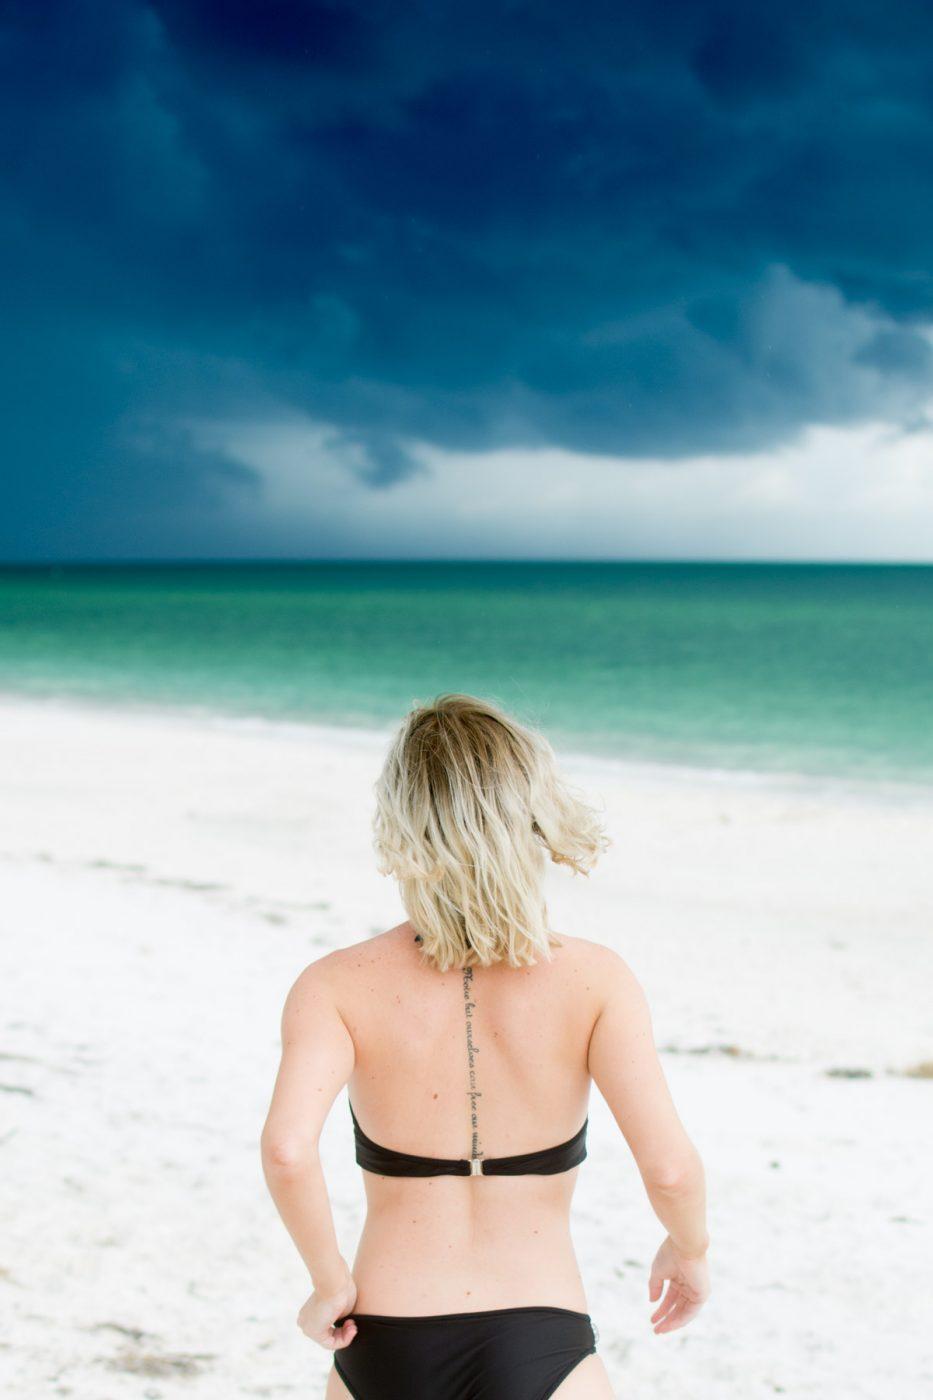 Bikini from Groopdealz - Sweet Teal